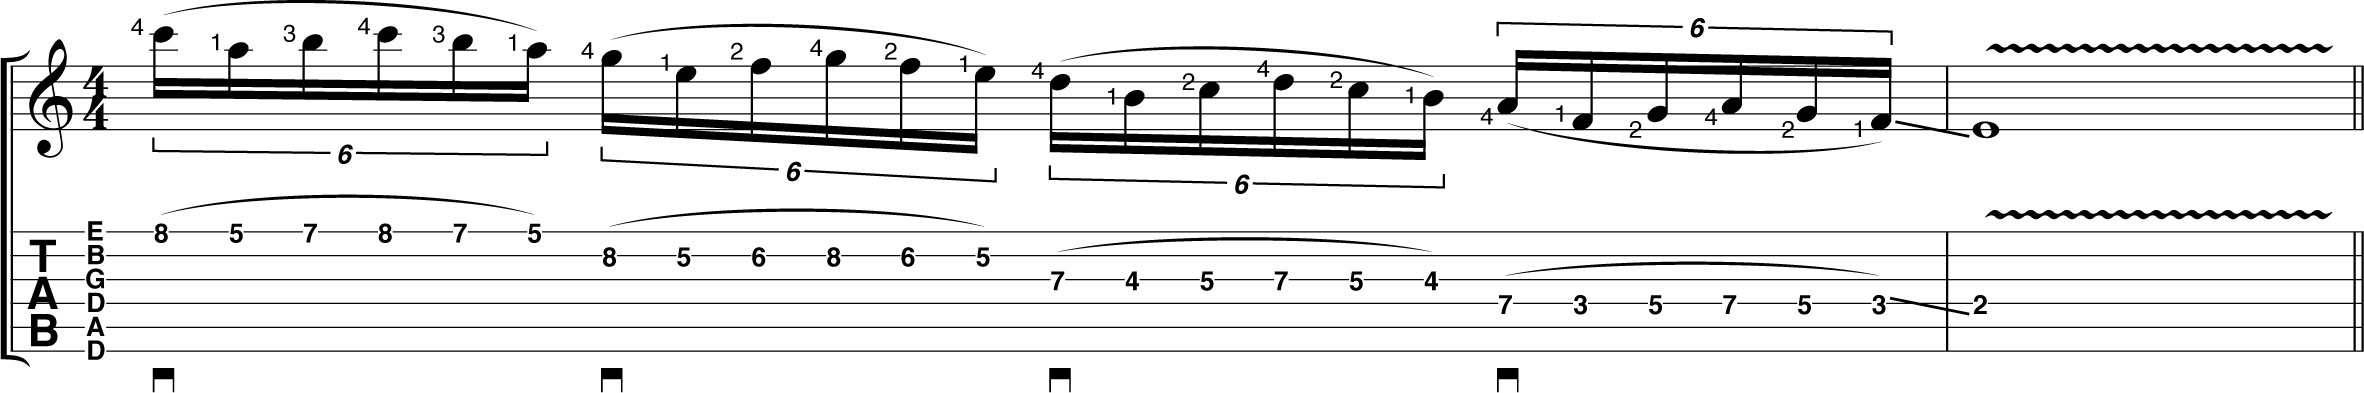 alexi-laiho-razminka-ex-10